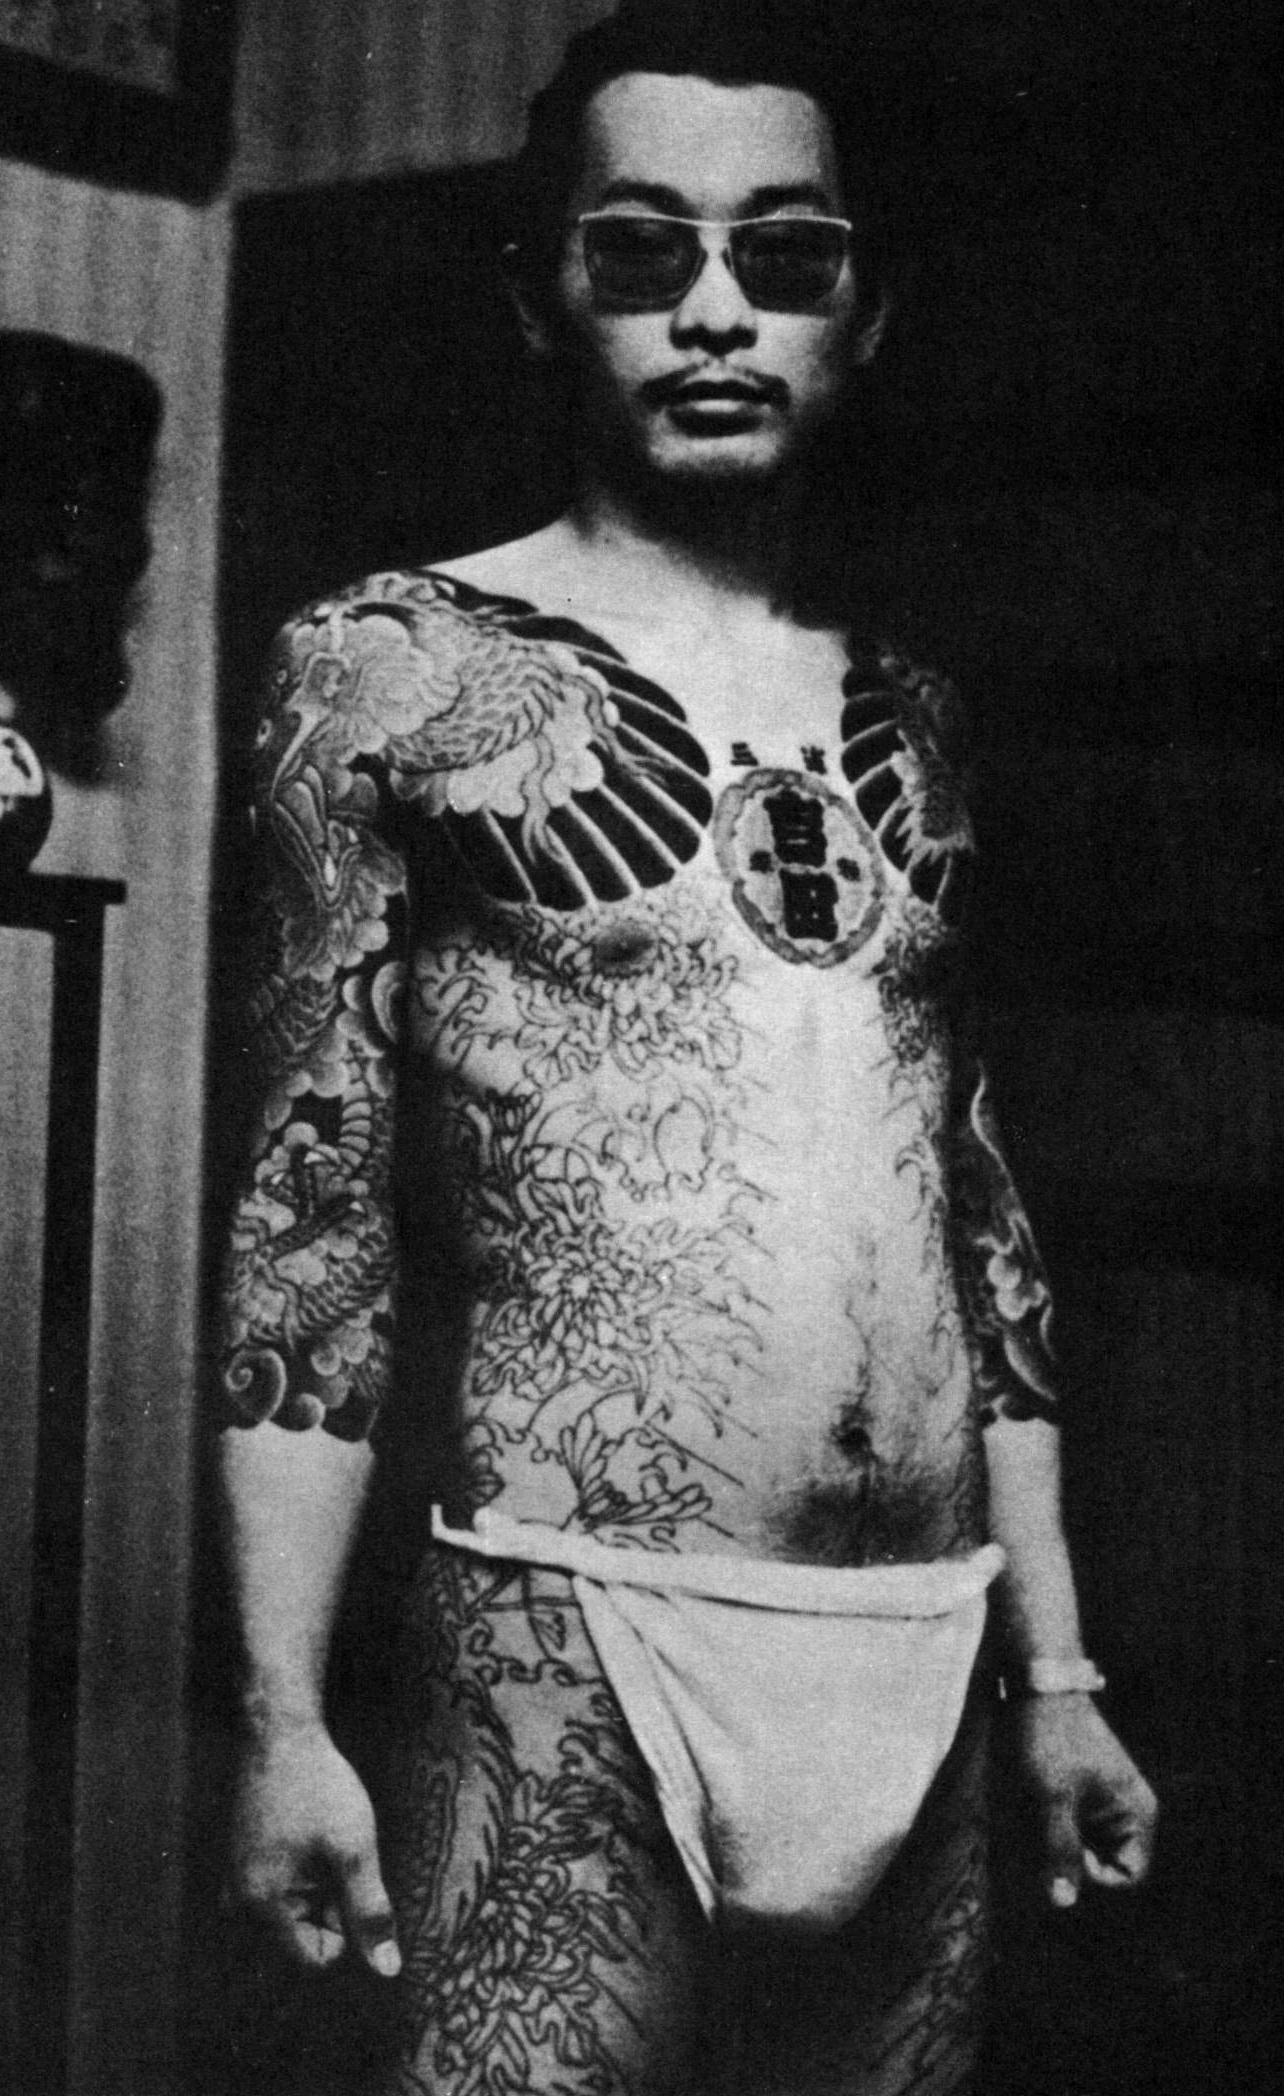 Los tatuajes, elemento fundamental de la cultura yakuza.